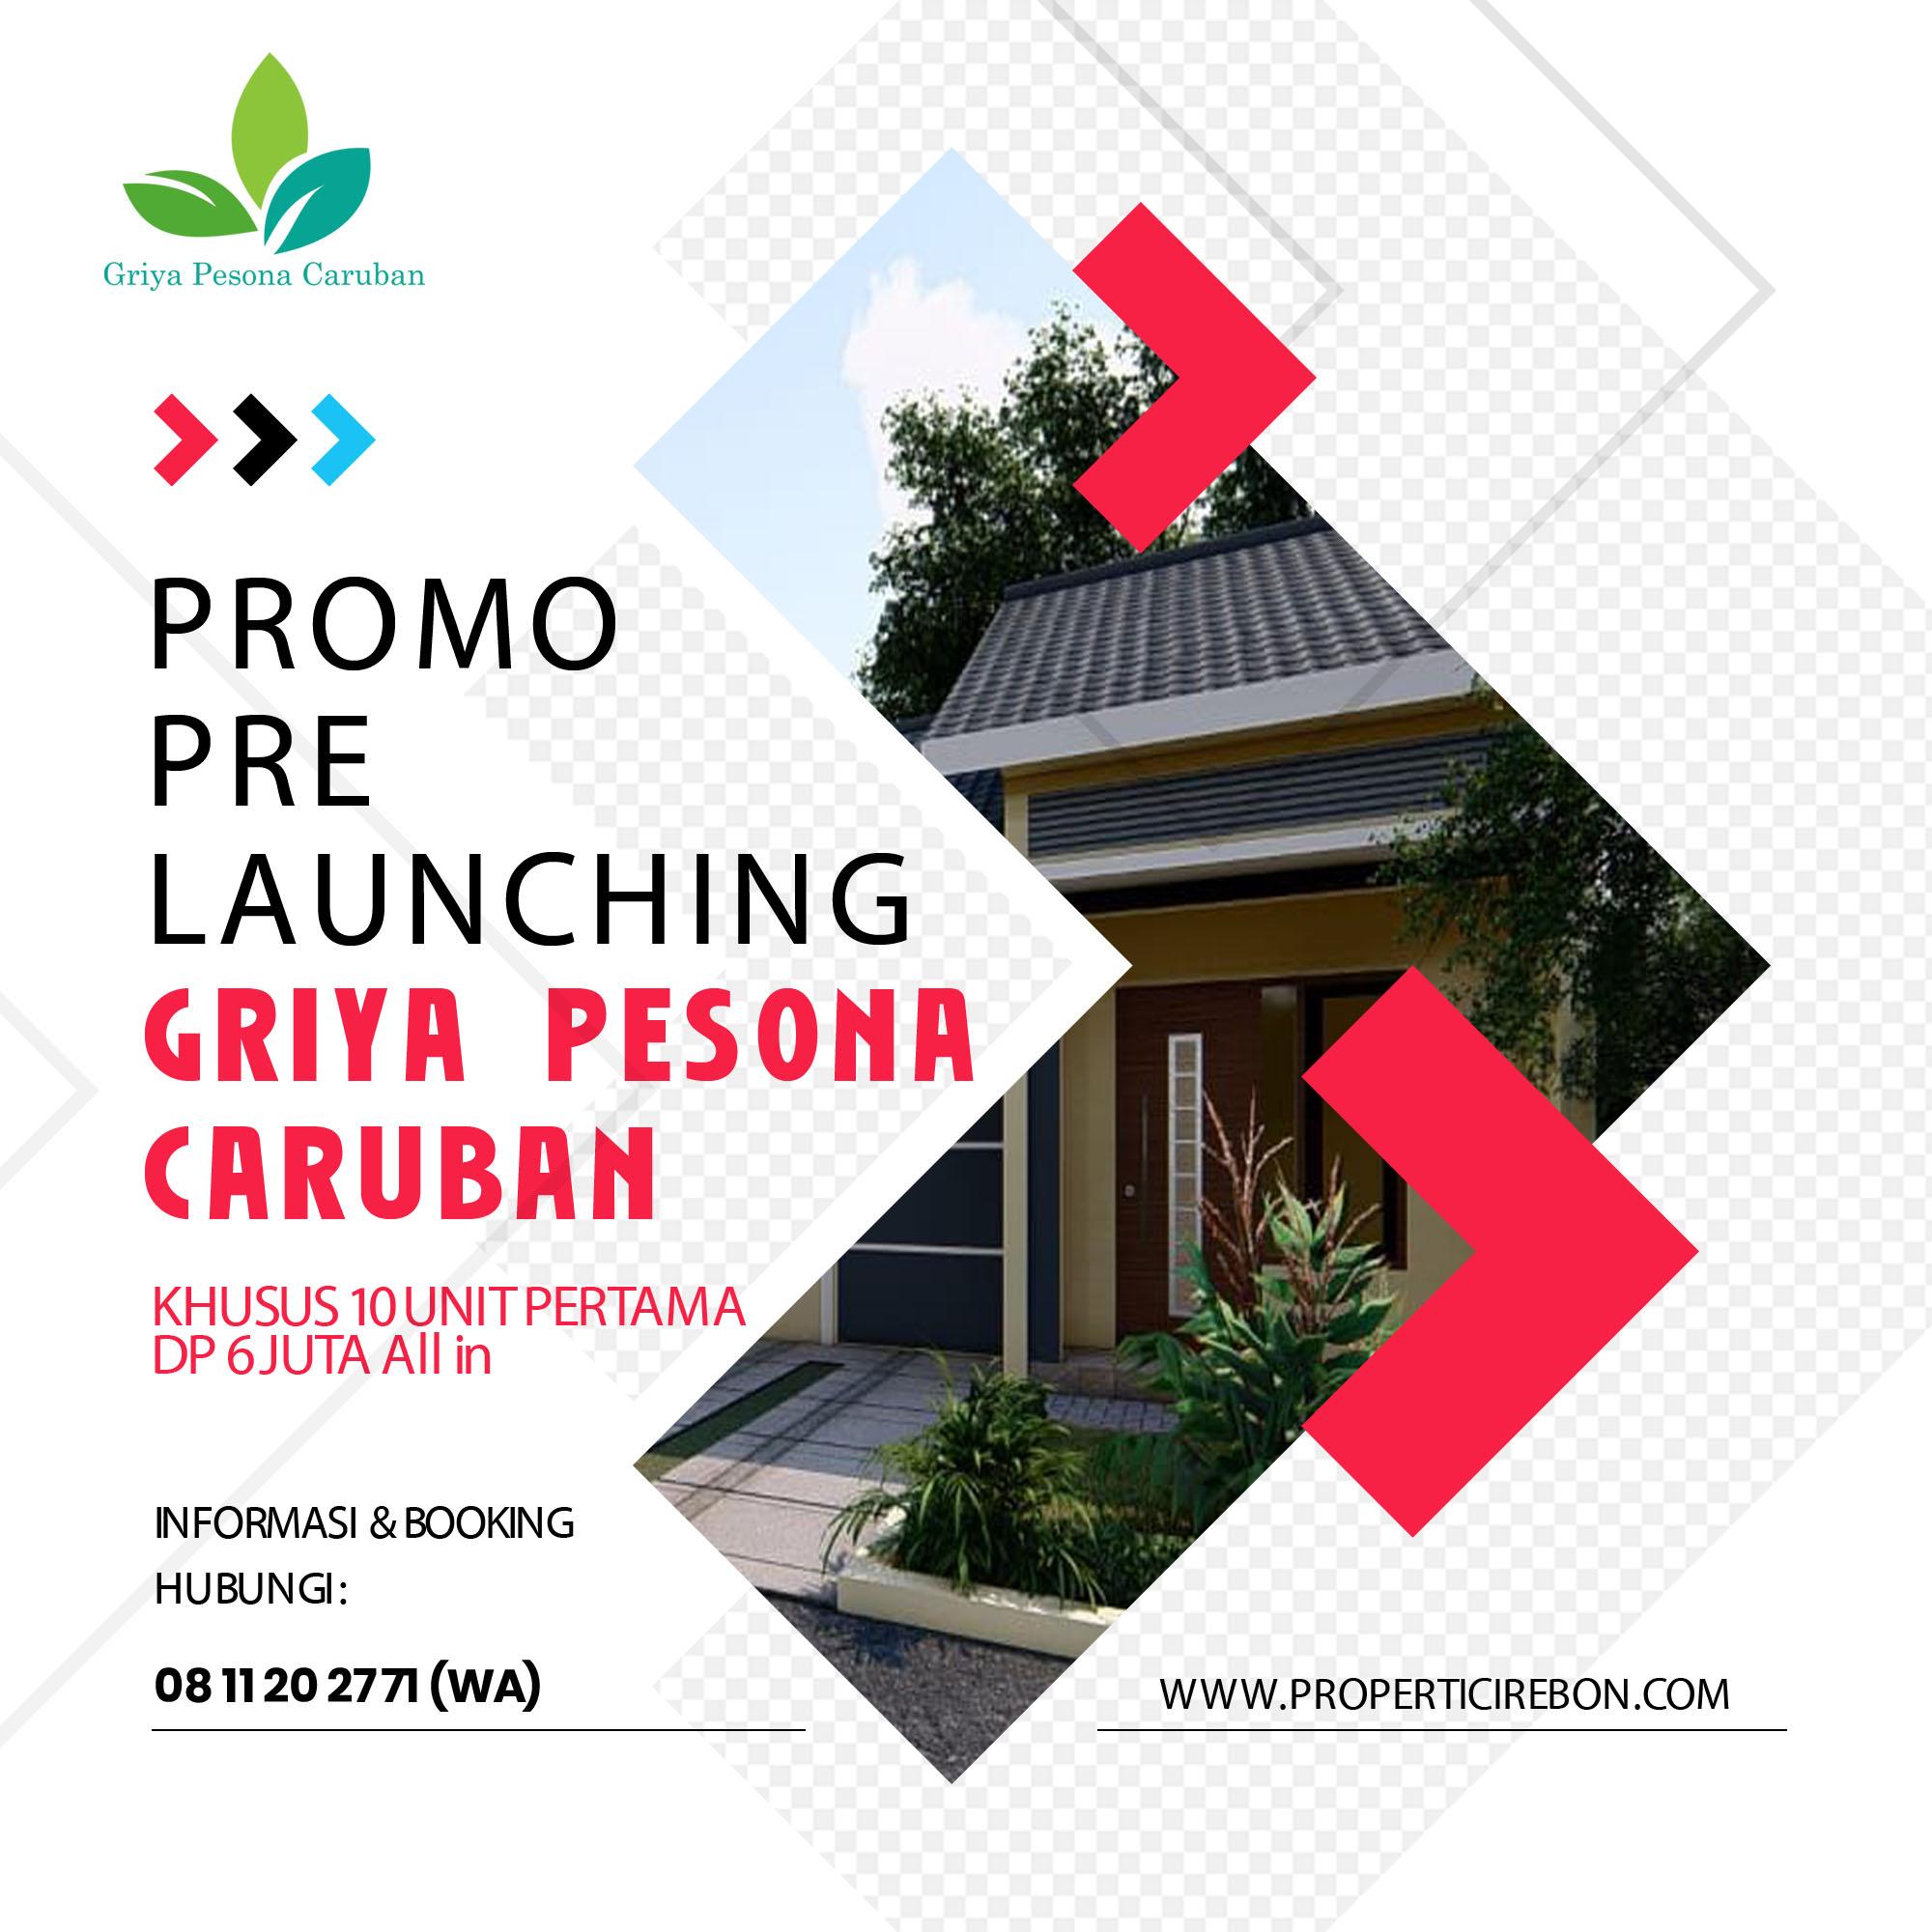 Bidik Milenial, Griya Pesona Caruban Promo Pre Launching